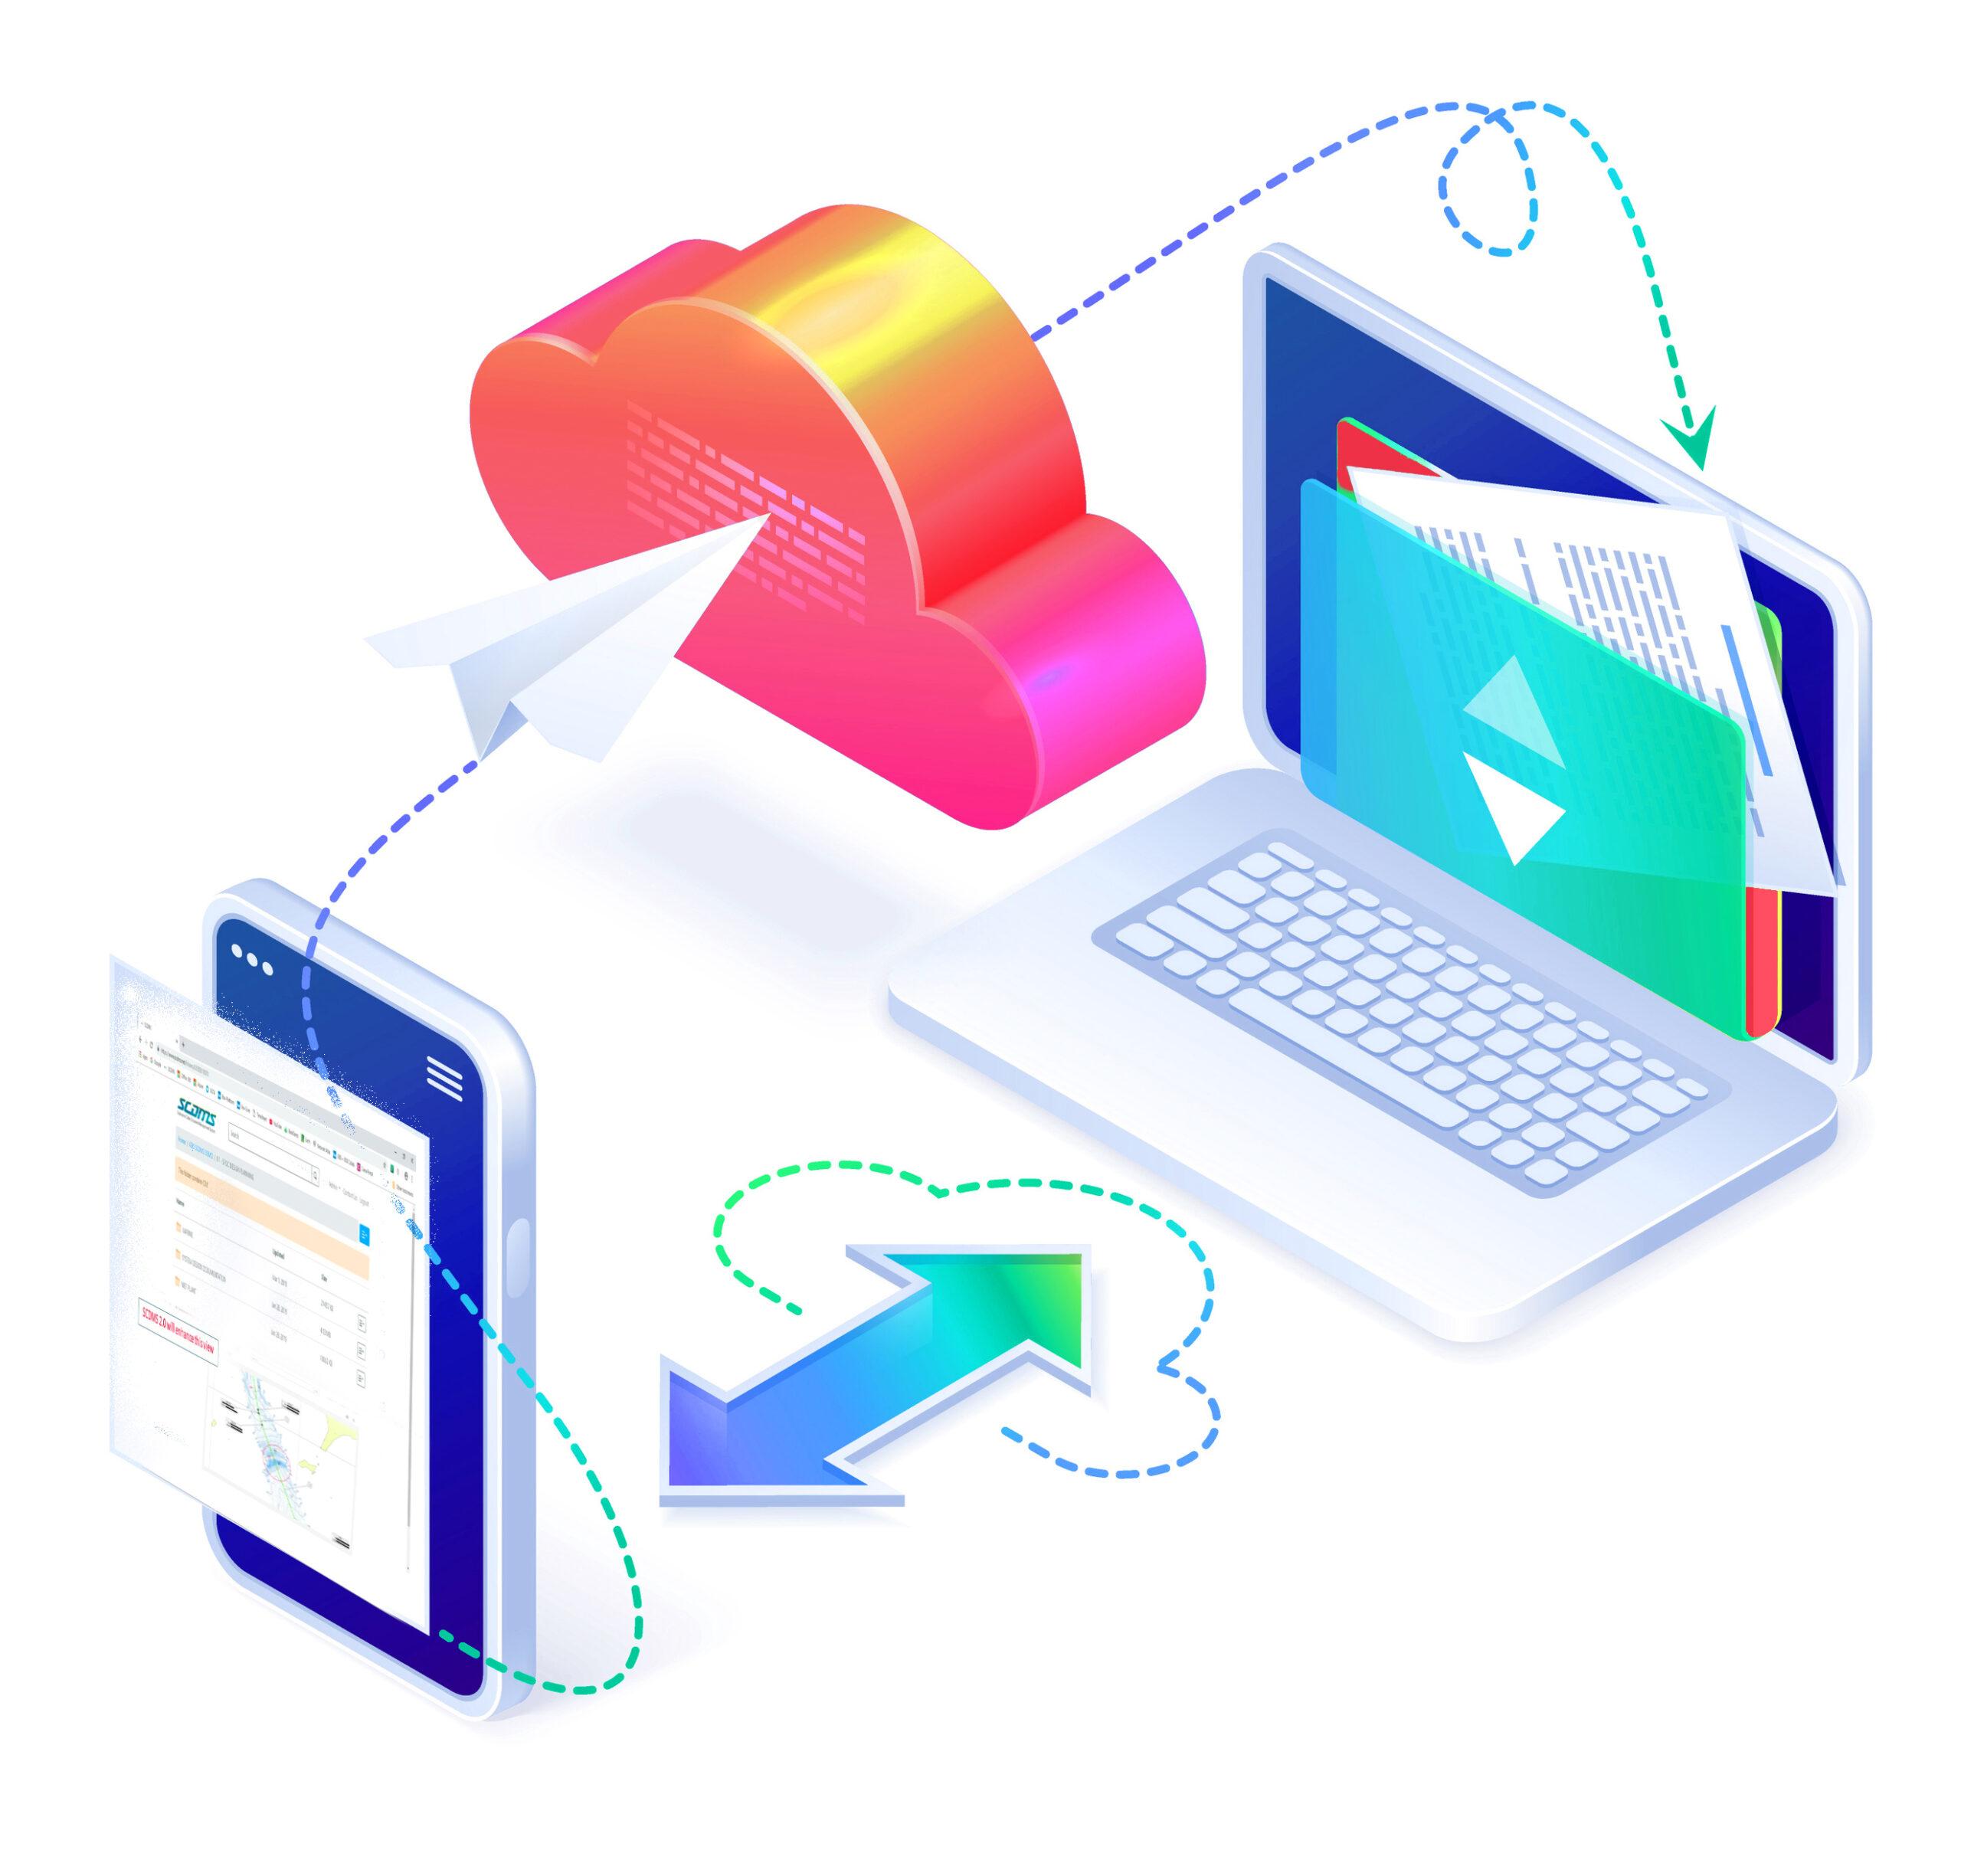 digitize files